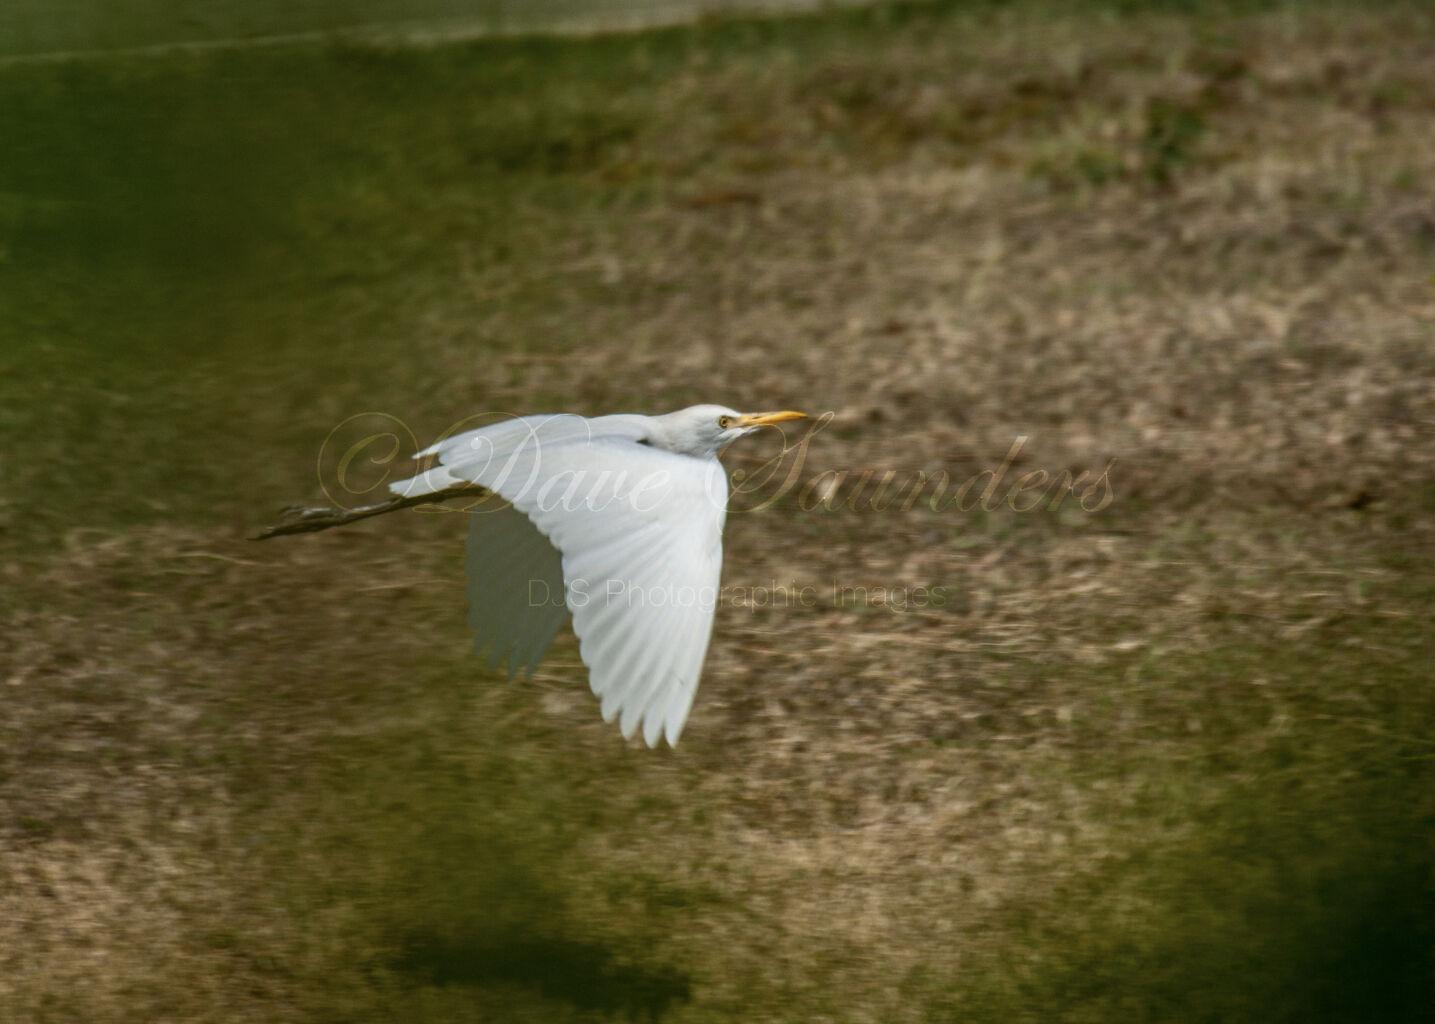 Western Cattle Egret (Bubulcus ibis) in flight